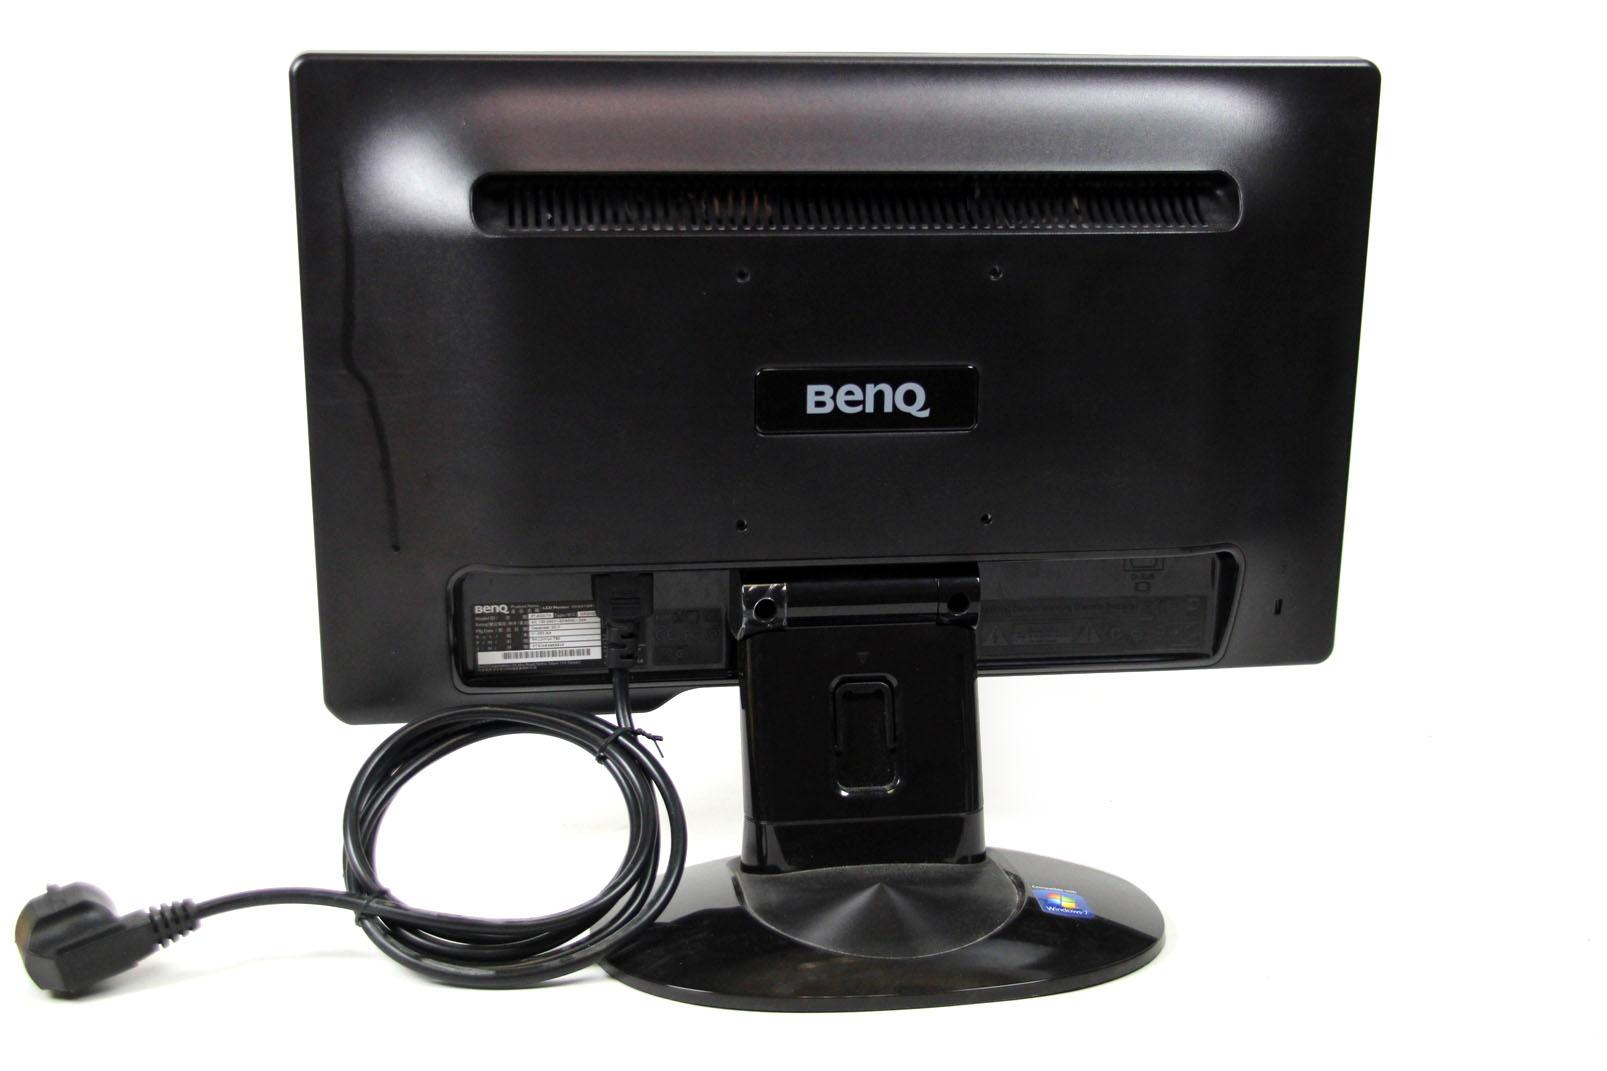 benq g925hda 18 5 monitor bildschirm lcd flachbildschirm. Black Bedroom Furniture Sets. Home Design Ideas